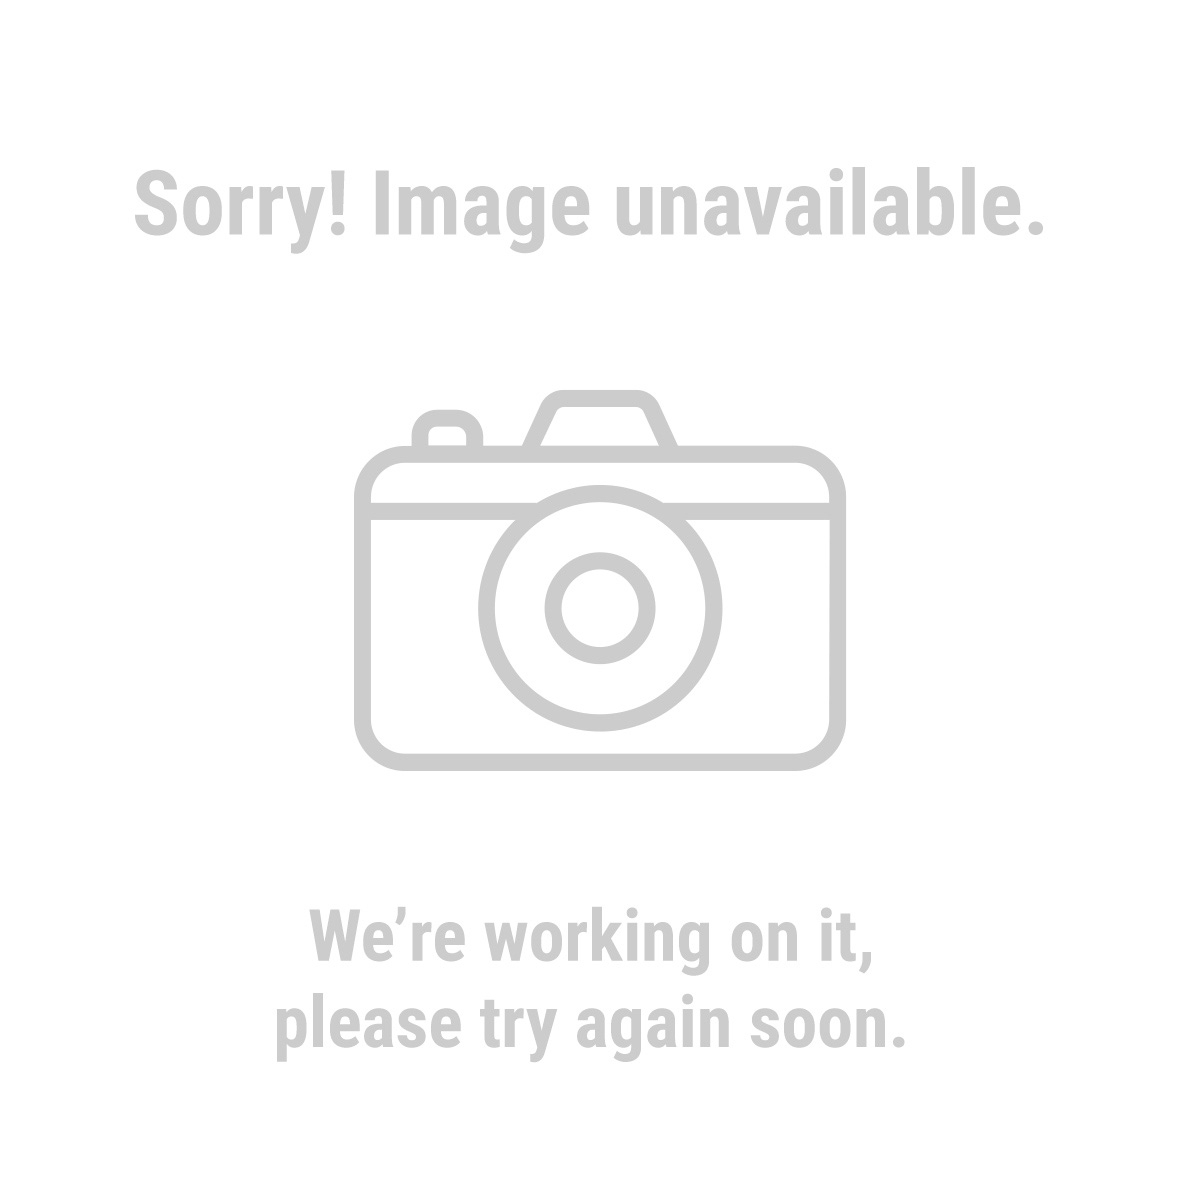 Haul-Master 98511 800 Lb. Capacity Full Size Truck Rack